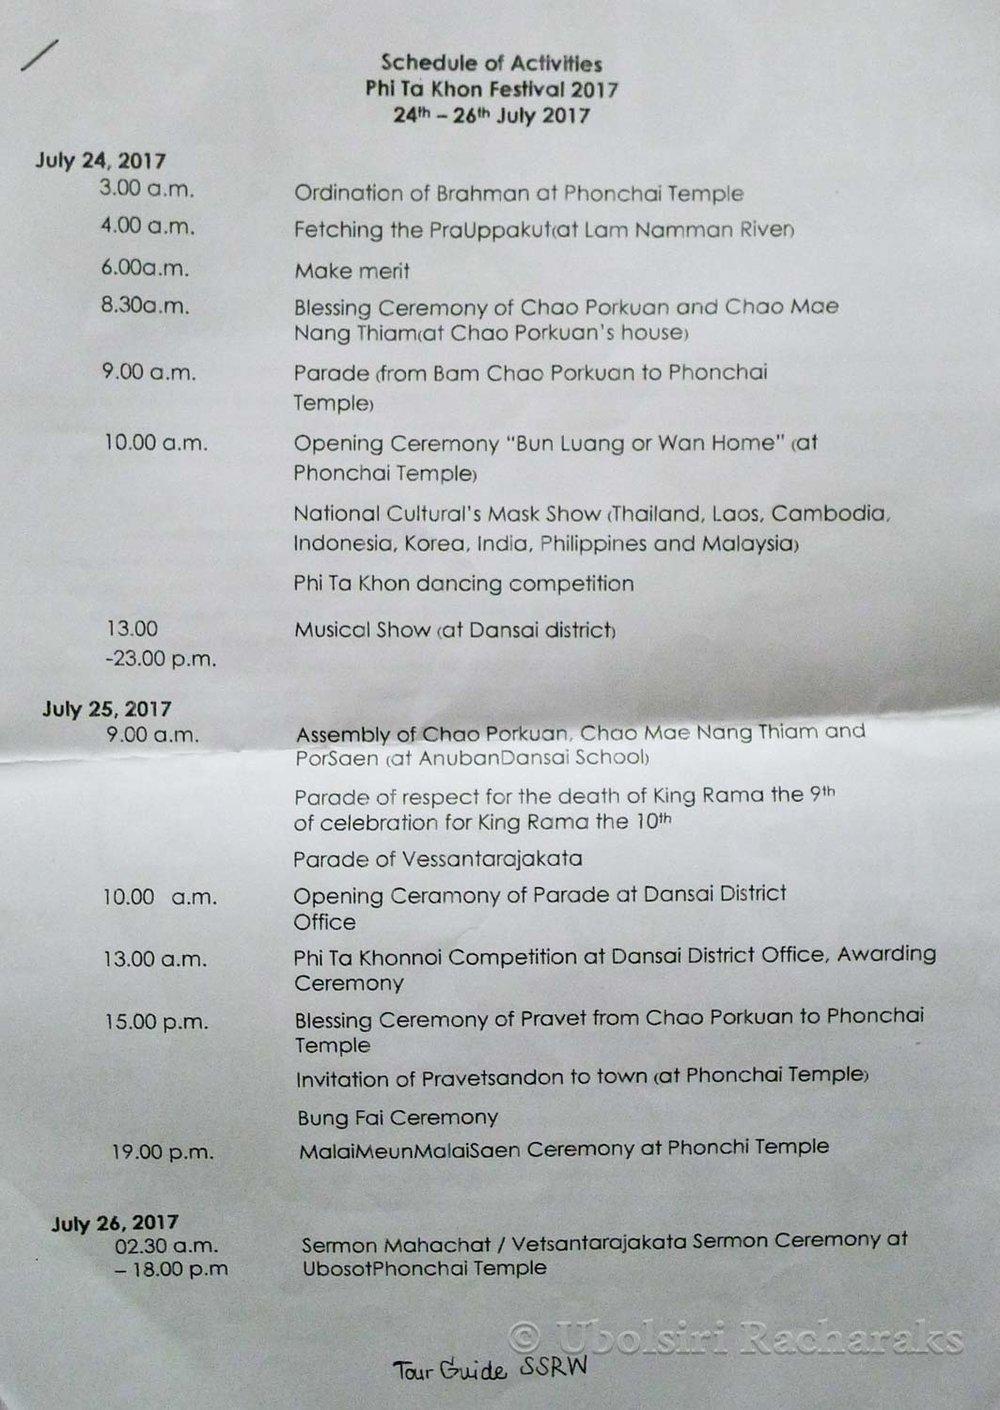 Phi Tha Khon Schedule 2017